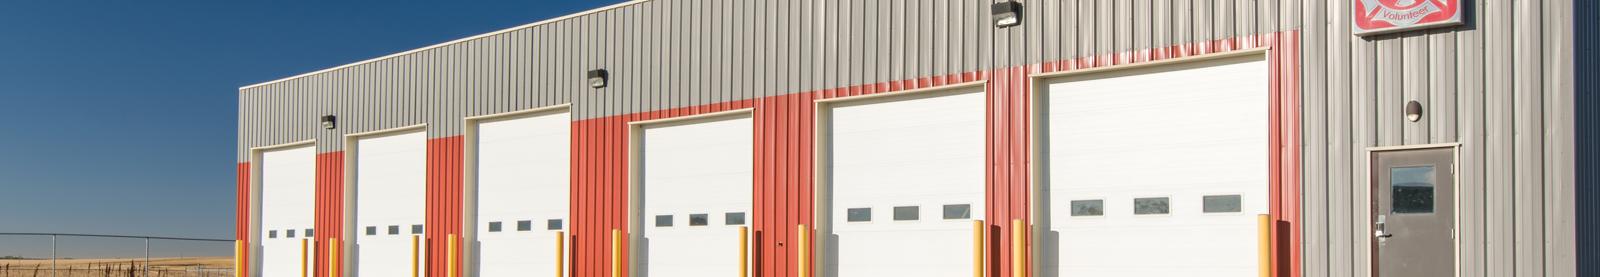 Pro Design Inc: Warehouse + Office Space